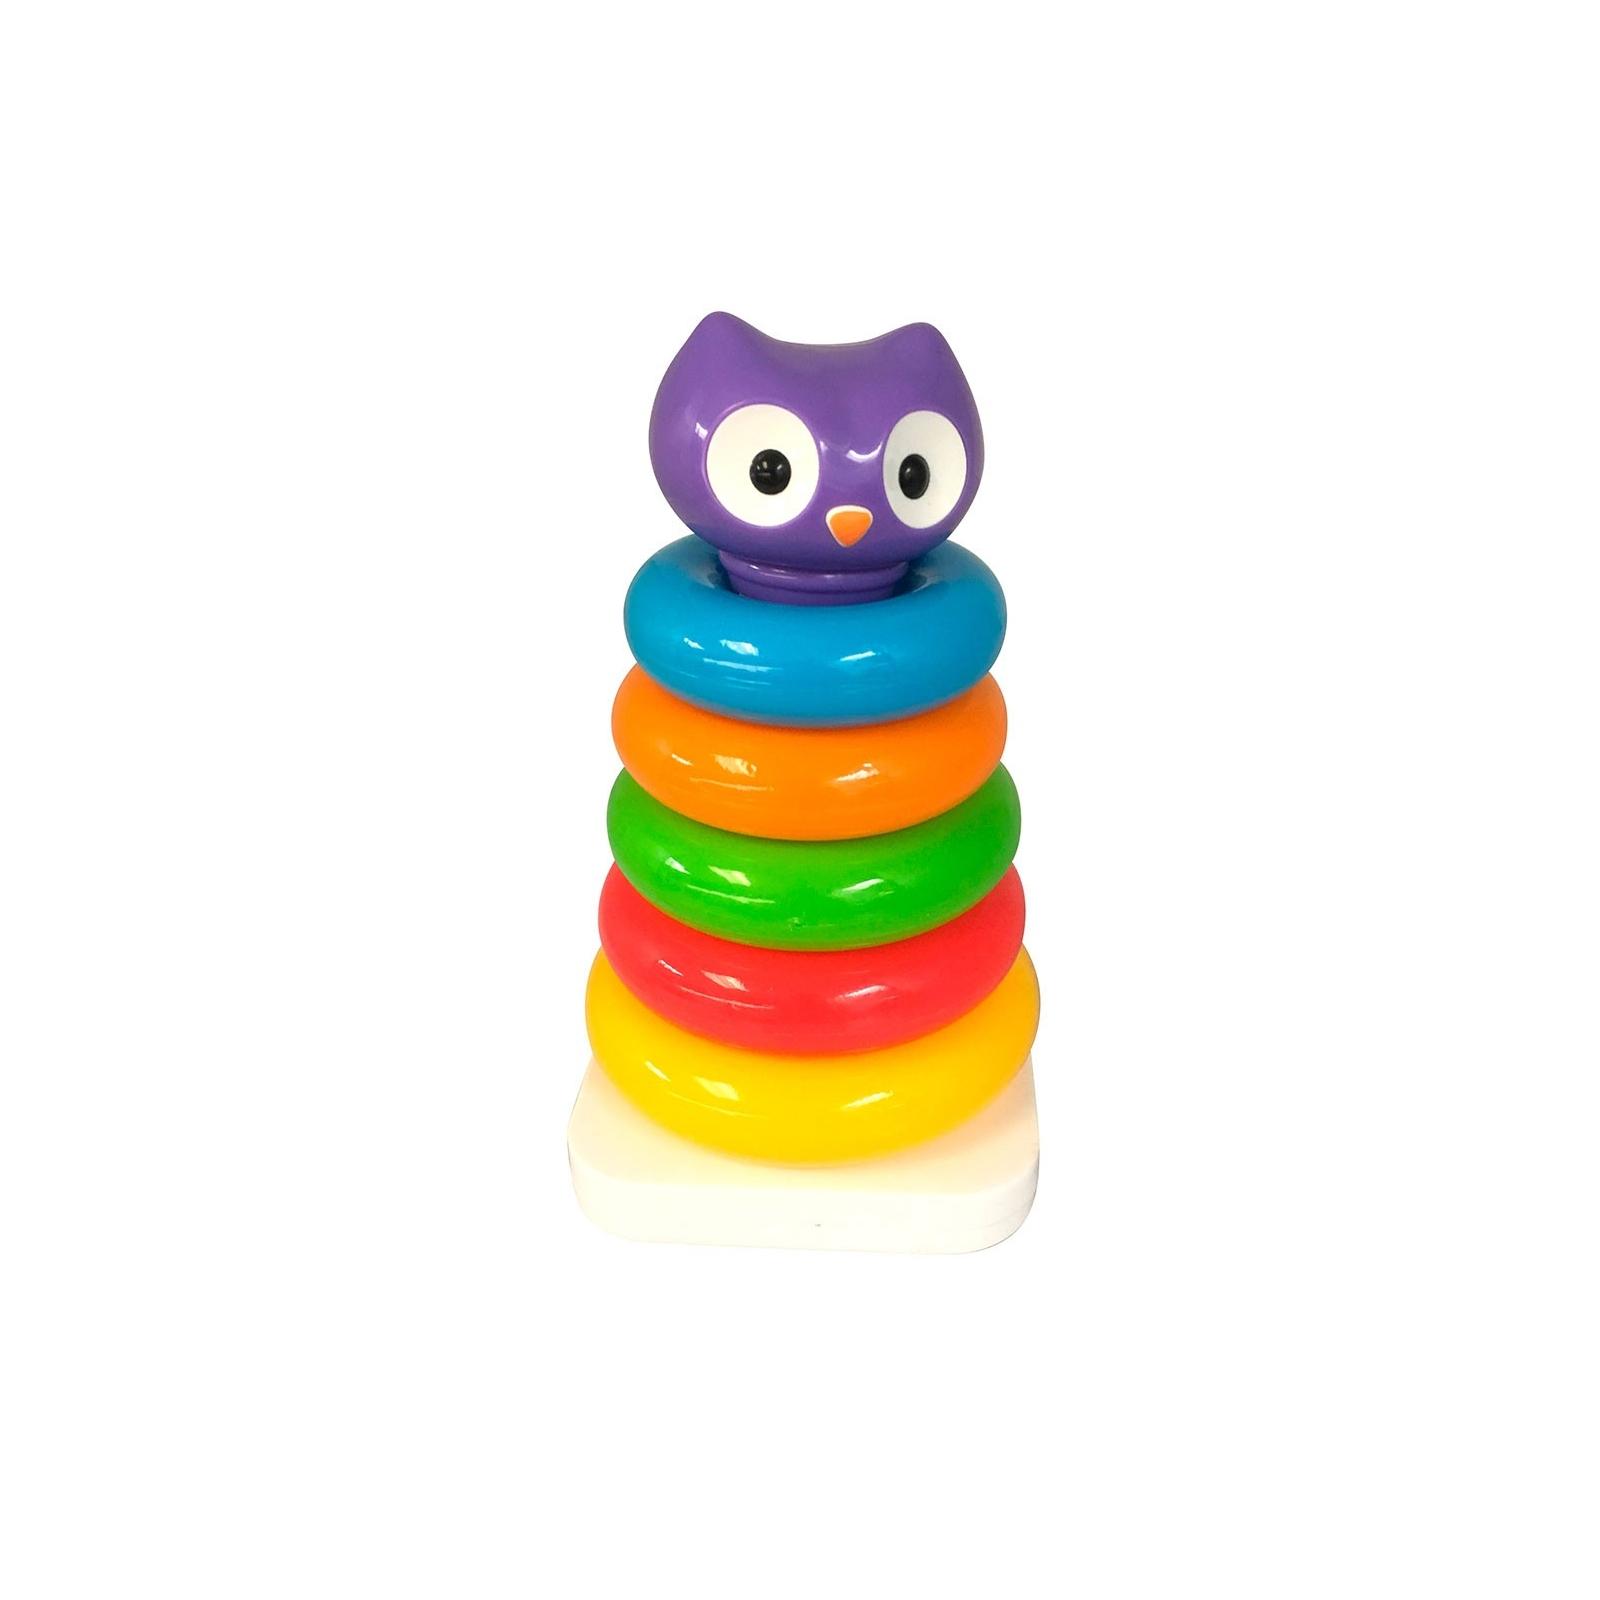 Развивающая игрушка Kiddieland Сова Пирамидка (057901)